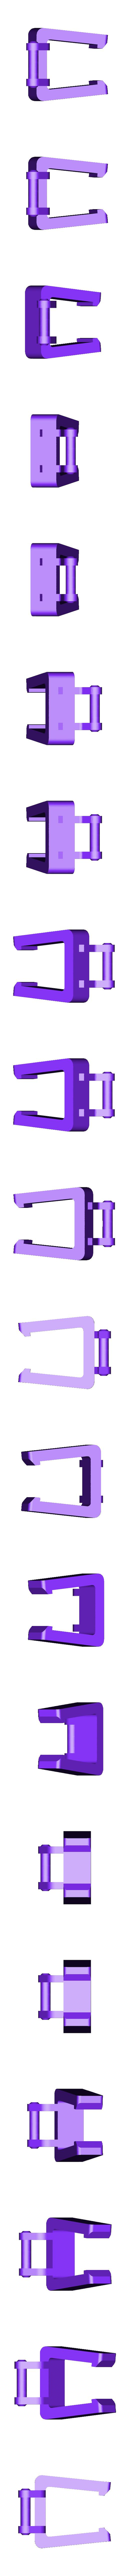 Arm_Right_05_OliveGreen.stl Download STL file Heavy Gun Walker • 3D print design, Jwoong